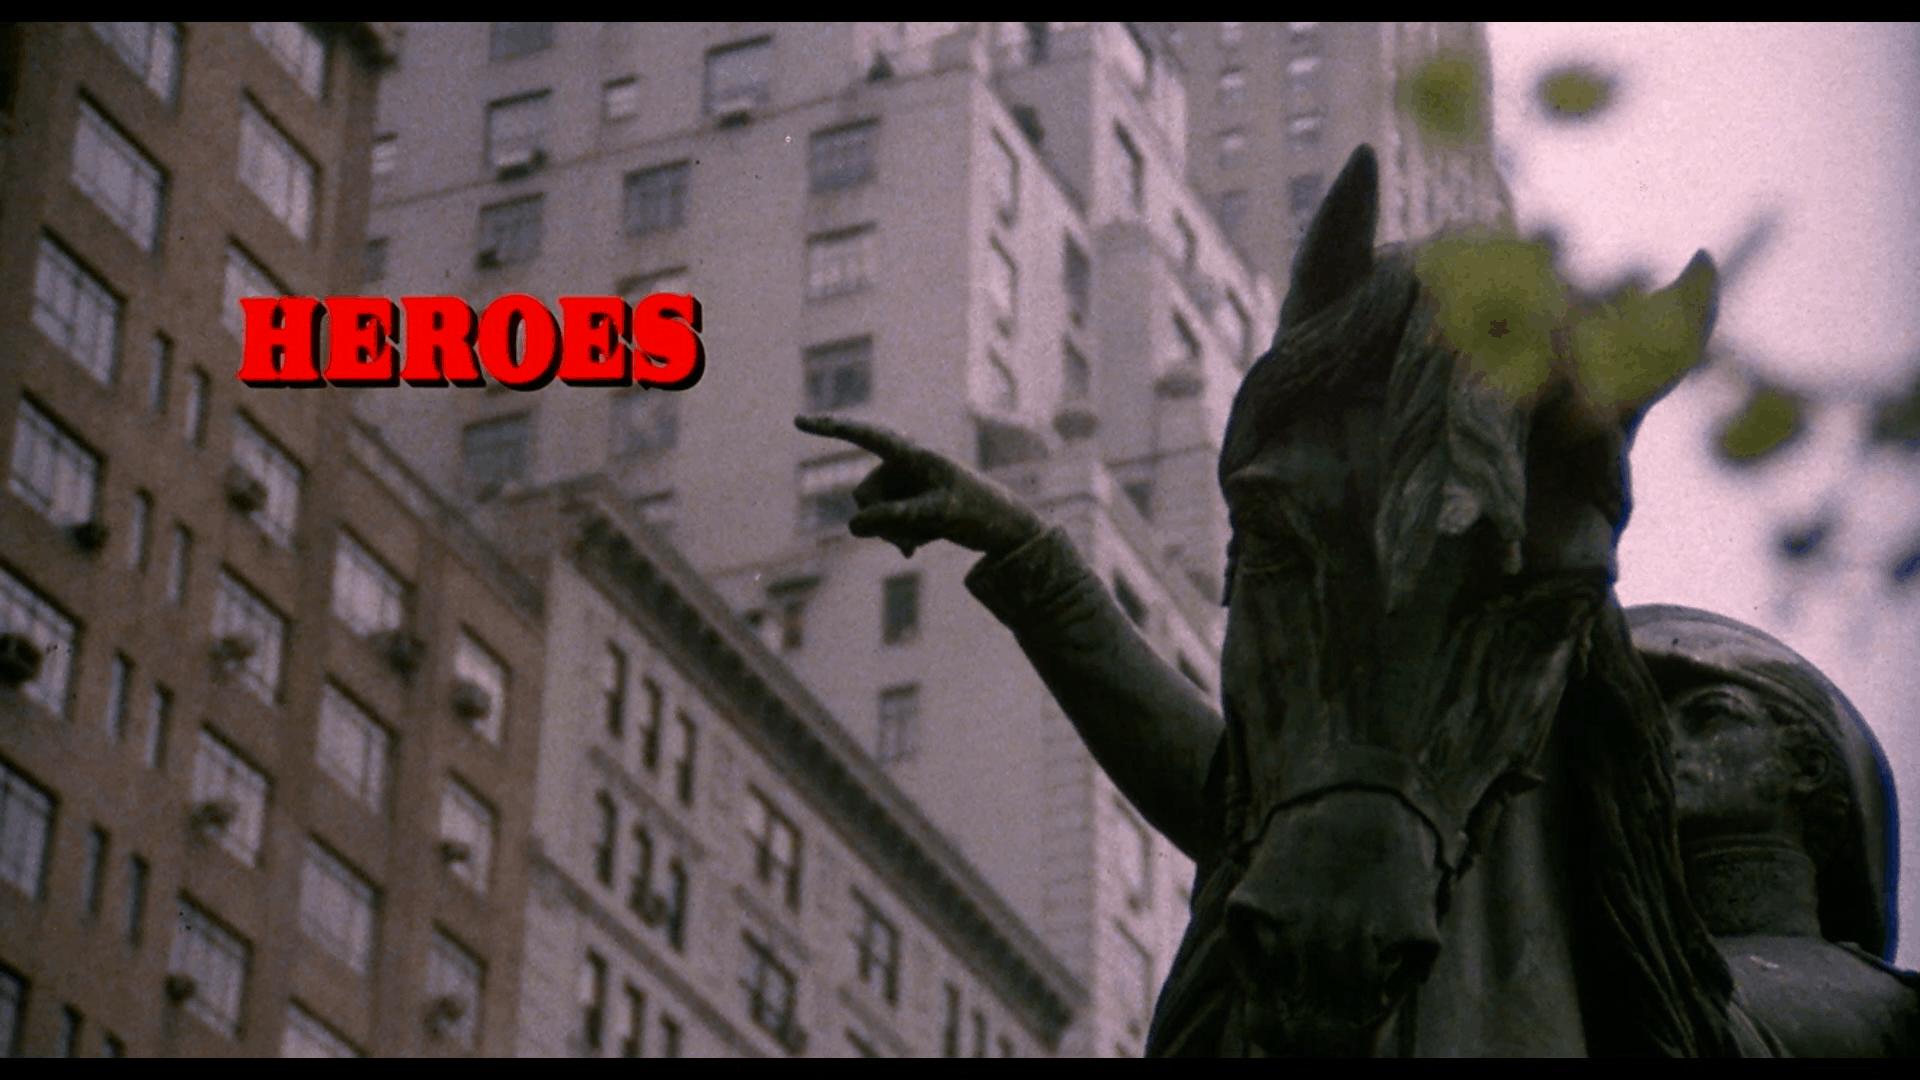 heroes mill creek blu-ray title